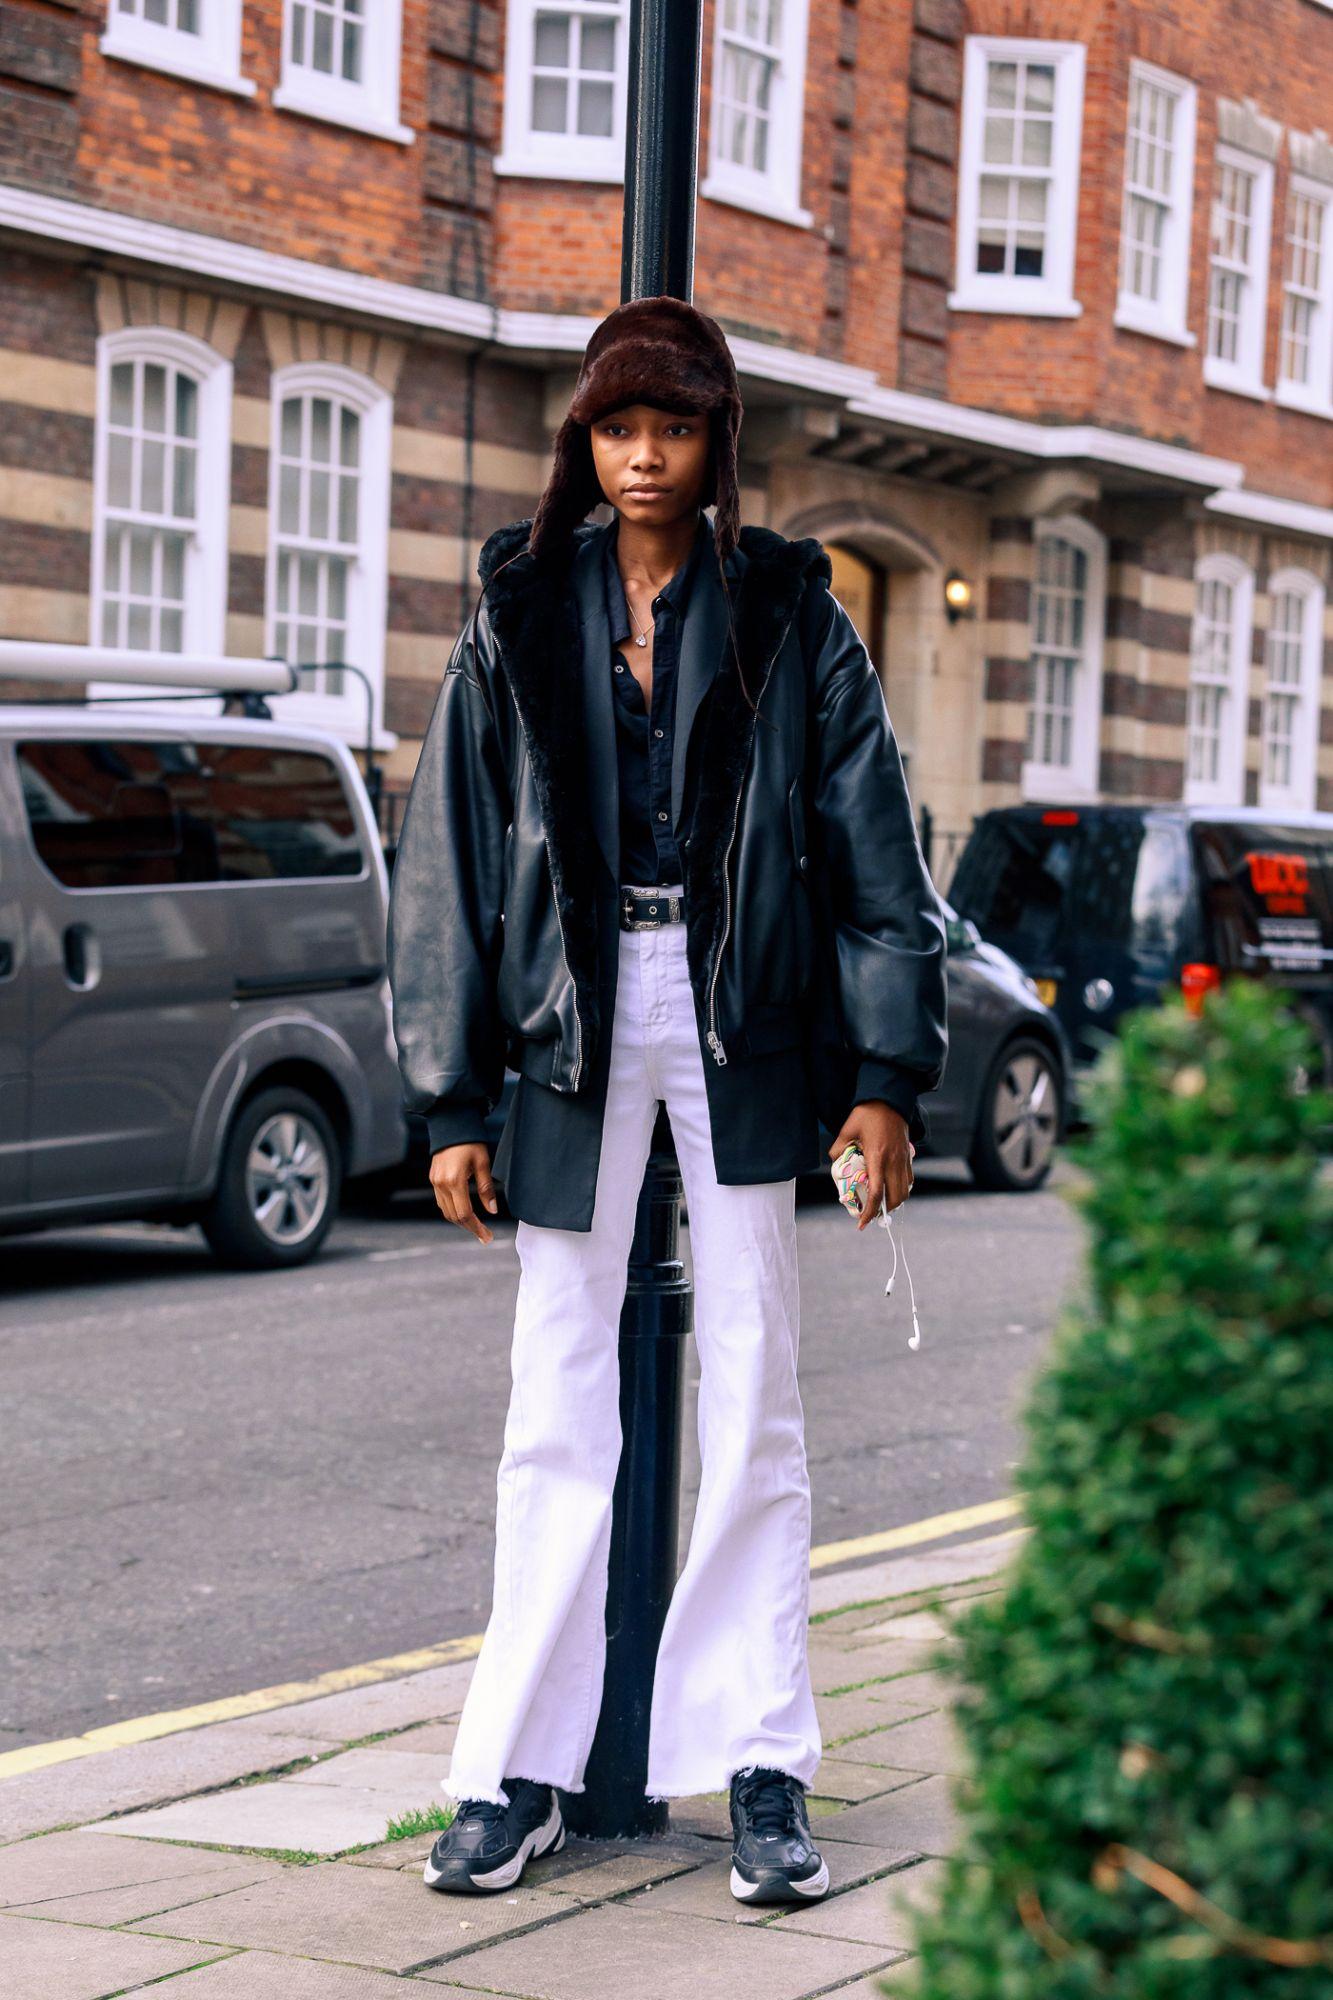 The Best Street Style From London Fashion Week Fall/Winter 2020